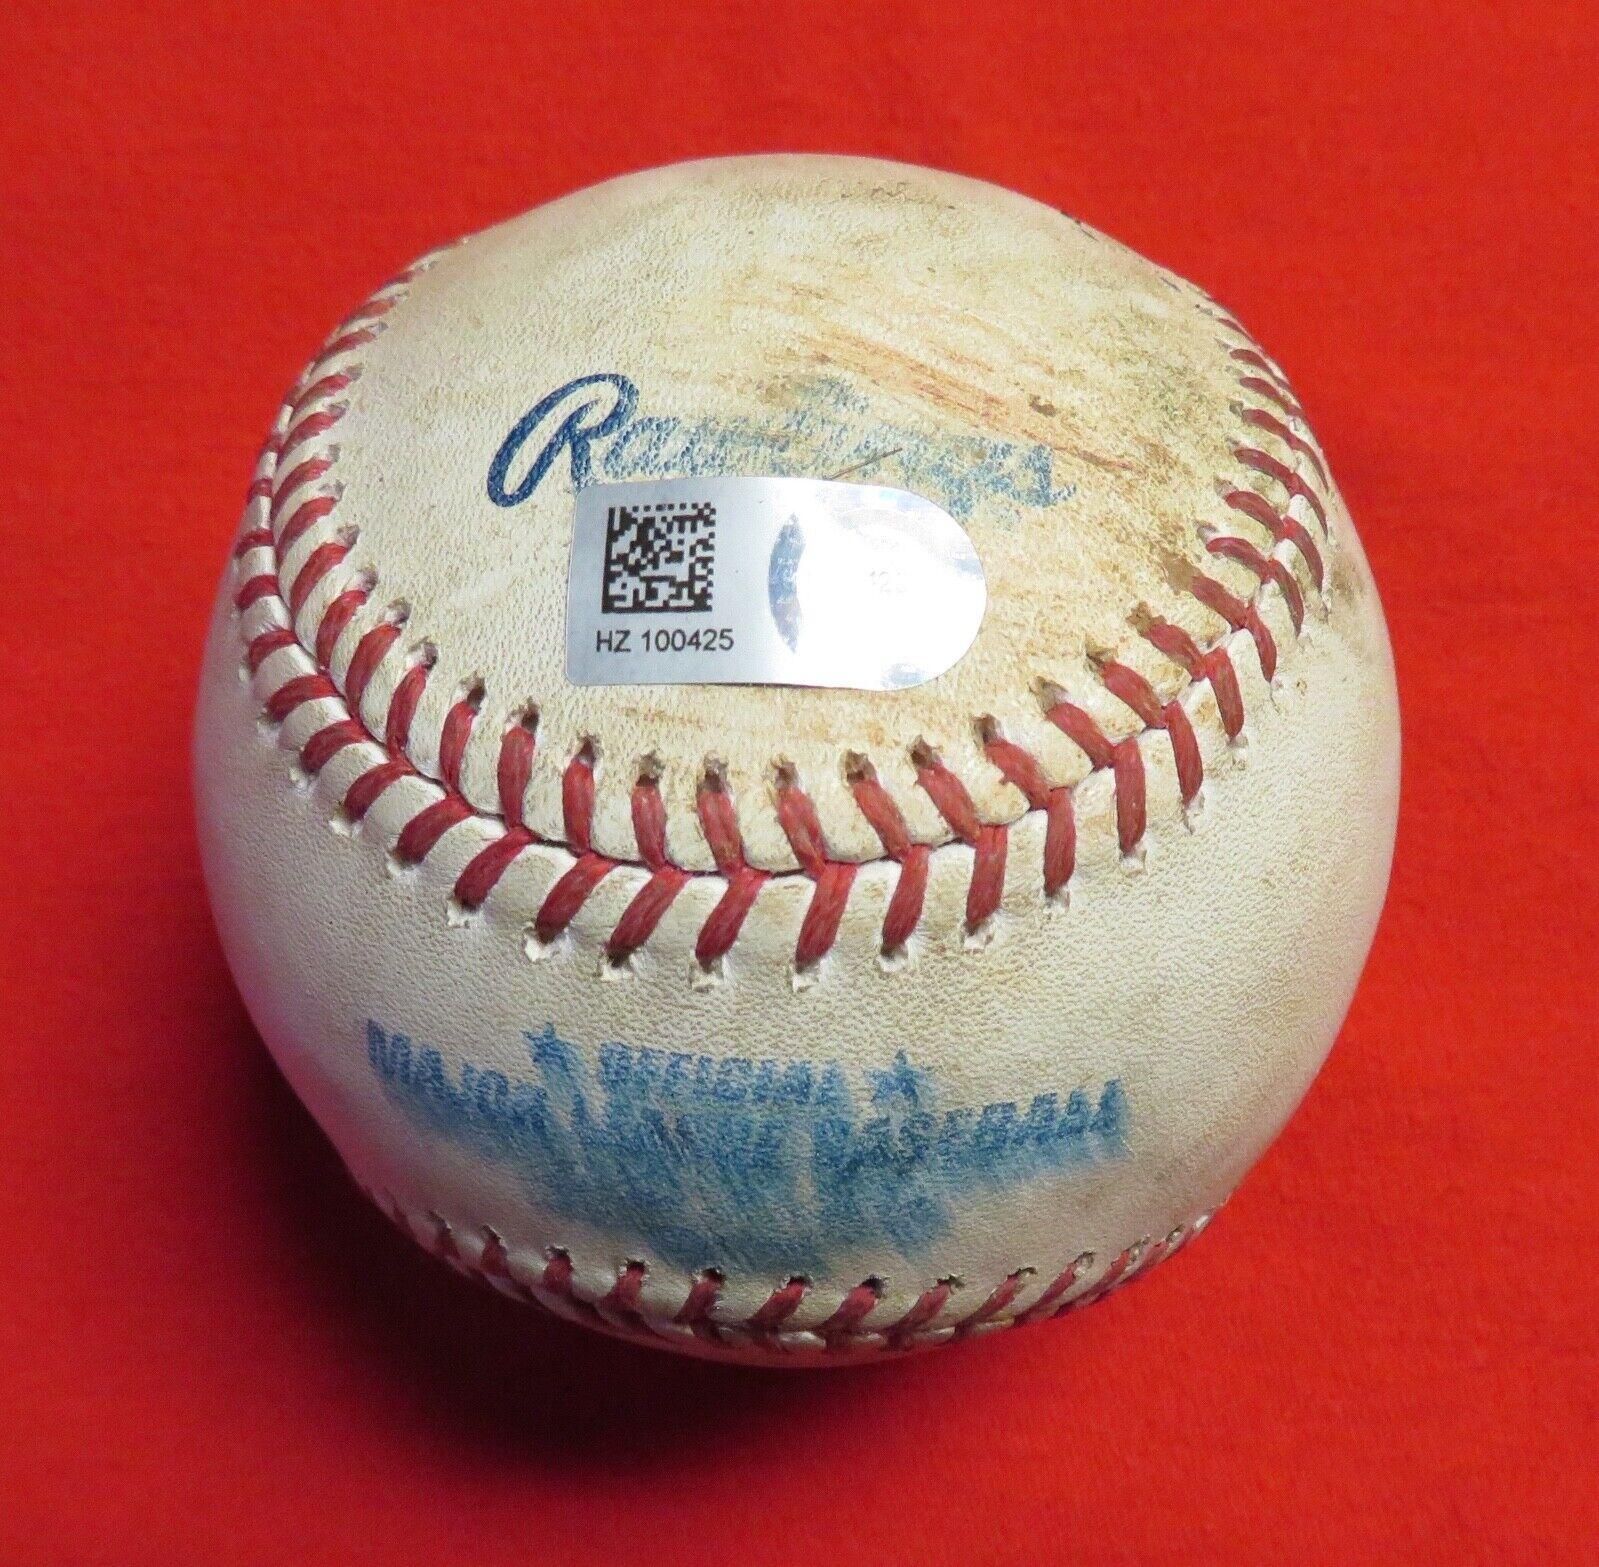 JOSH HAMILTON PID JACOB PETRICKA 6/7/14 MLB Game Used ANGELS White Sox RANGERS - $11.50